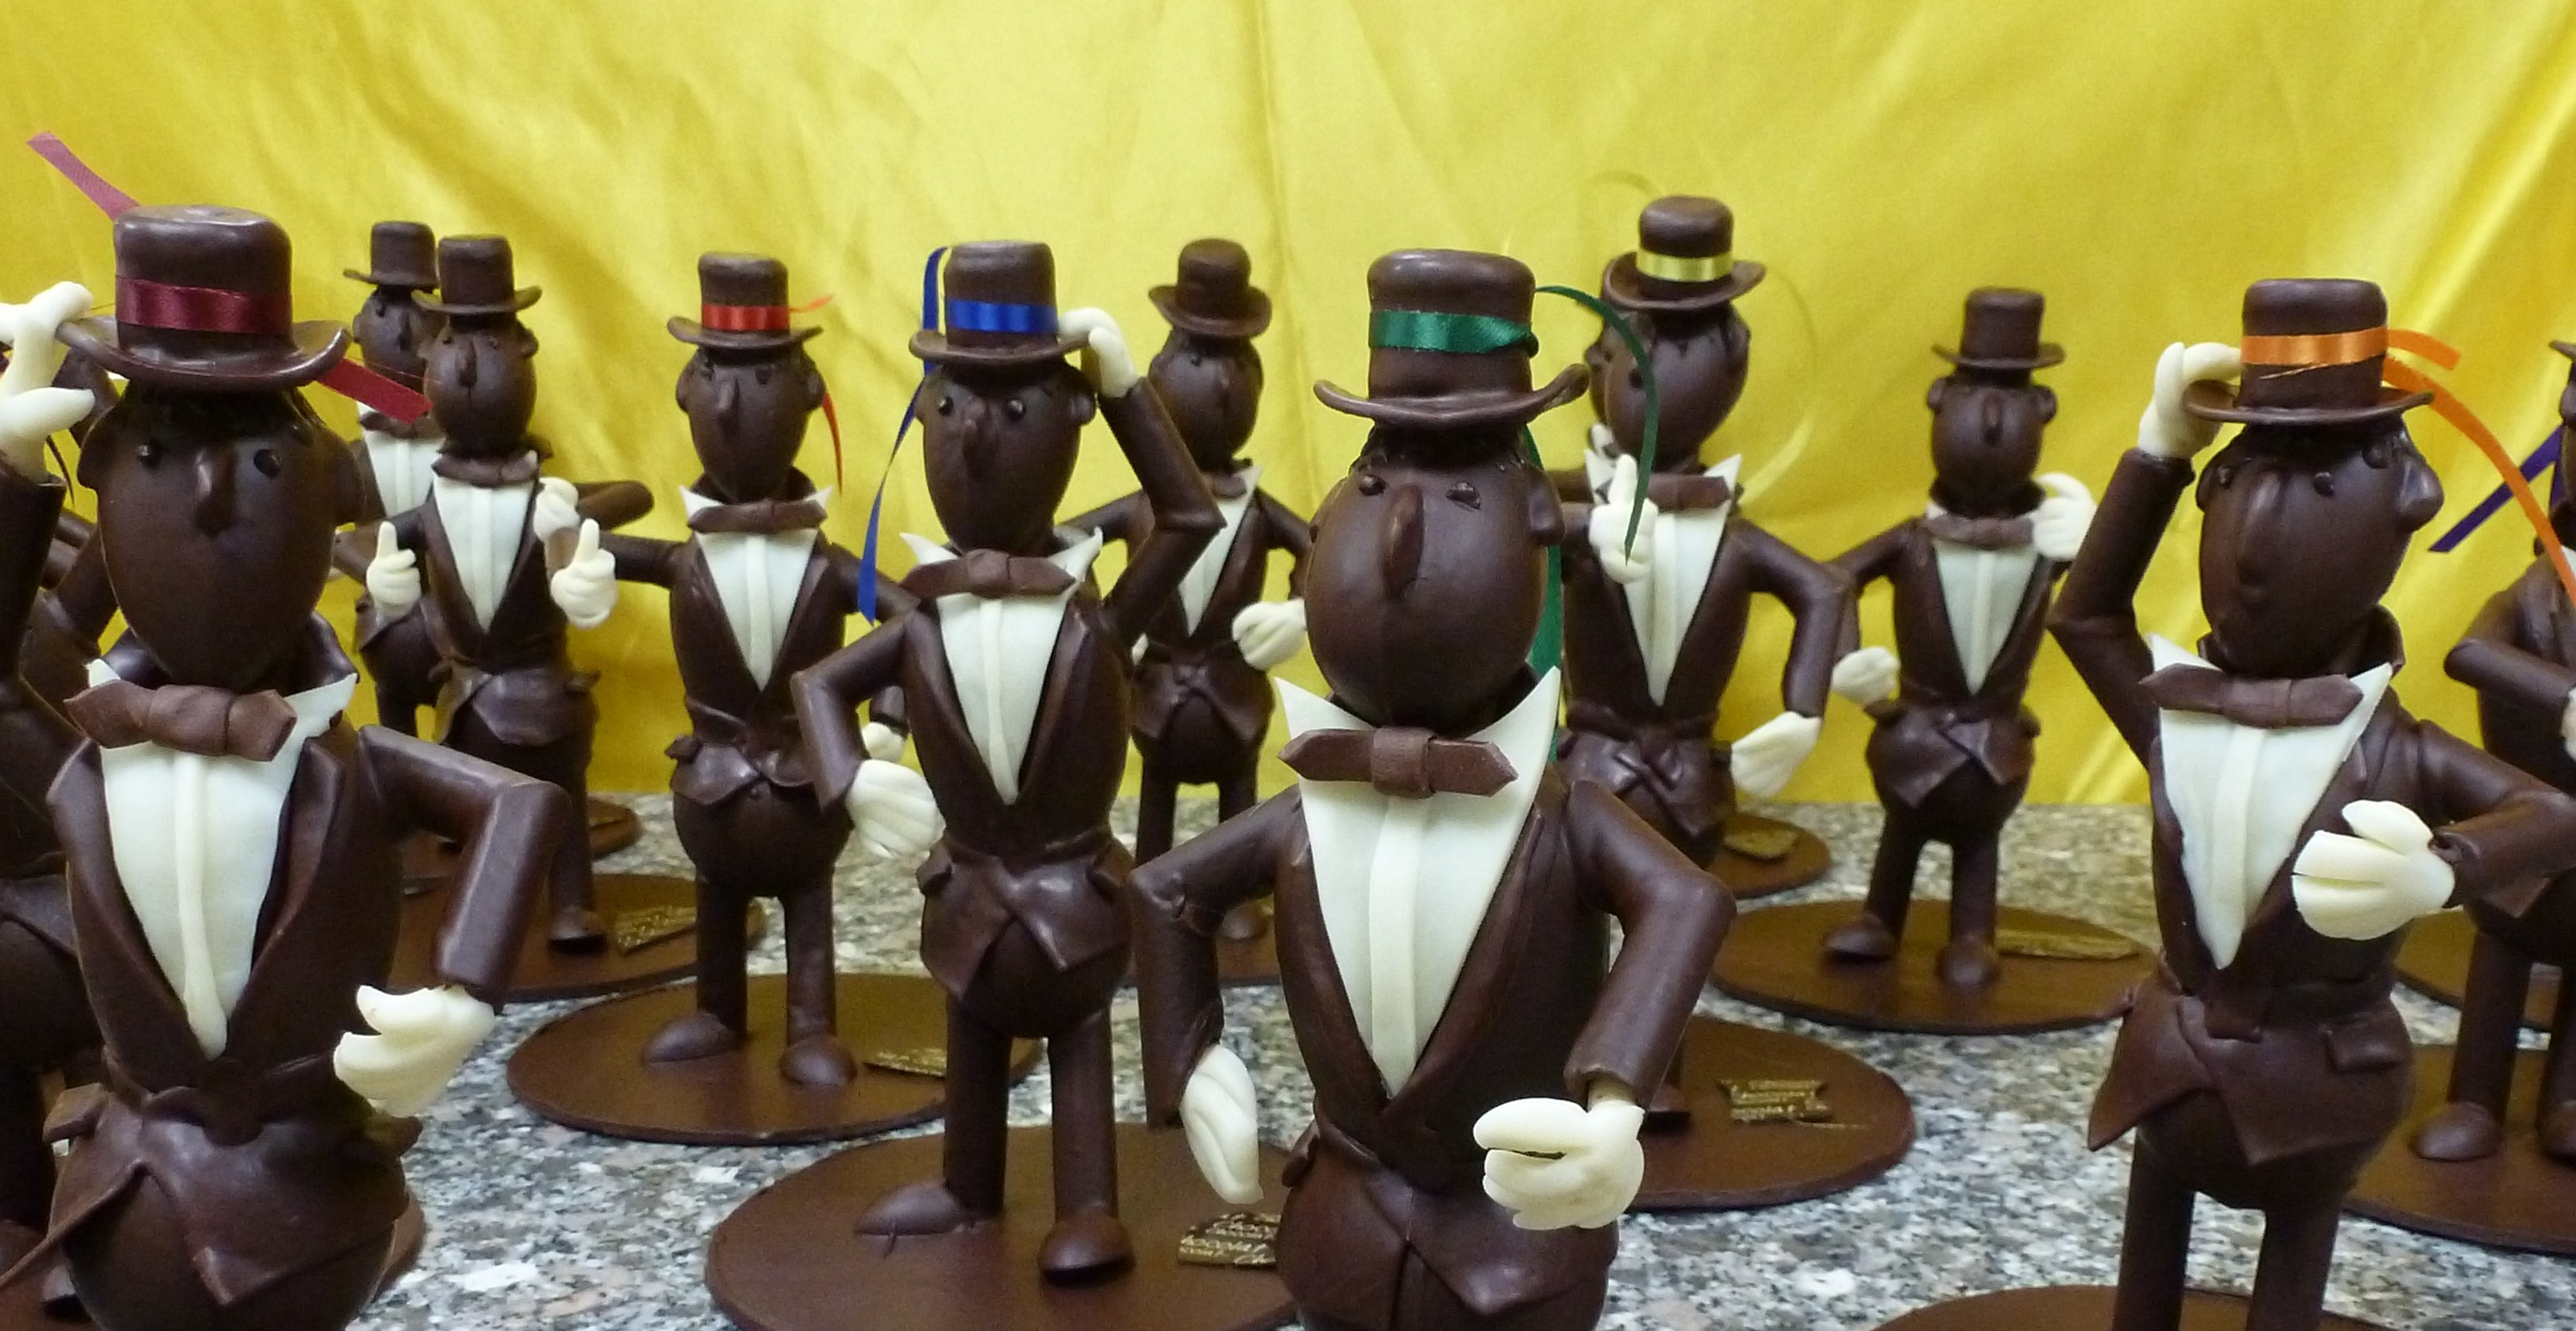 Chocolat - Chocolaterie Bruno Jourdan Villefranche sur Saône 69